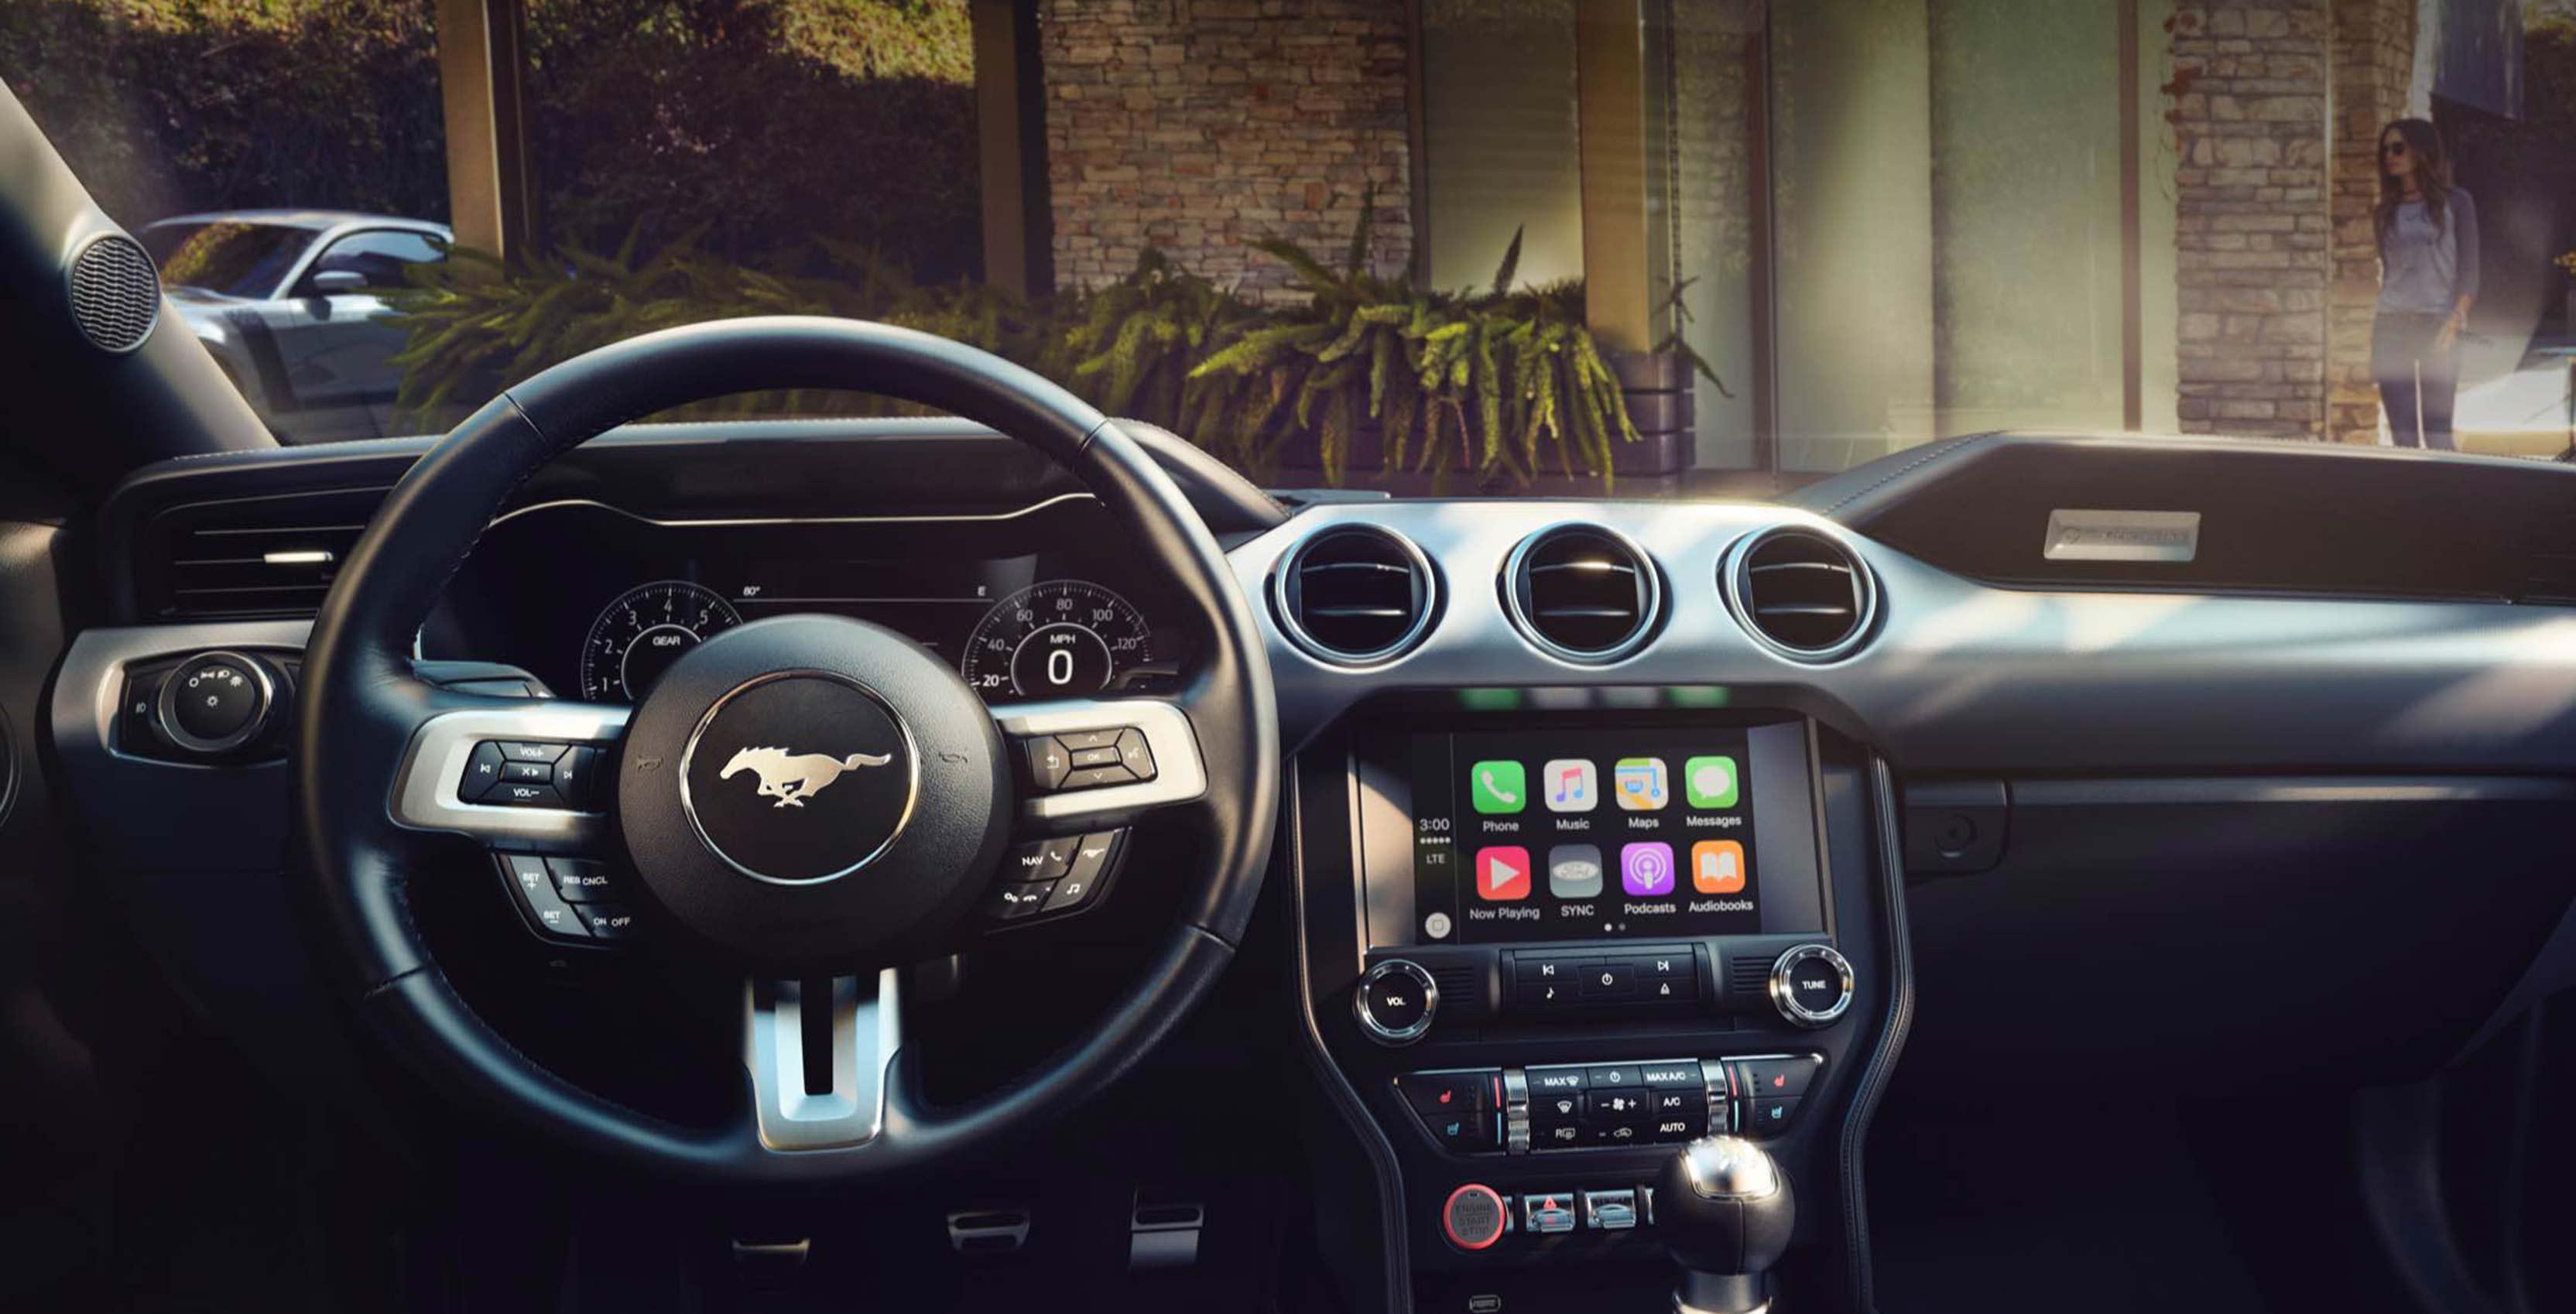 Ford Sync 3 infotainment system running CarPlay